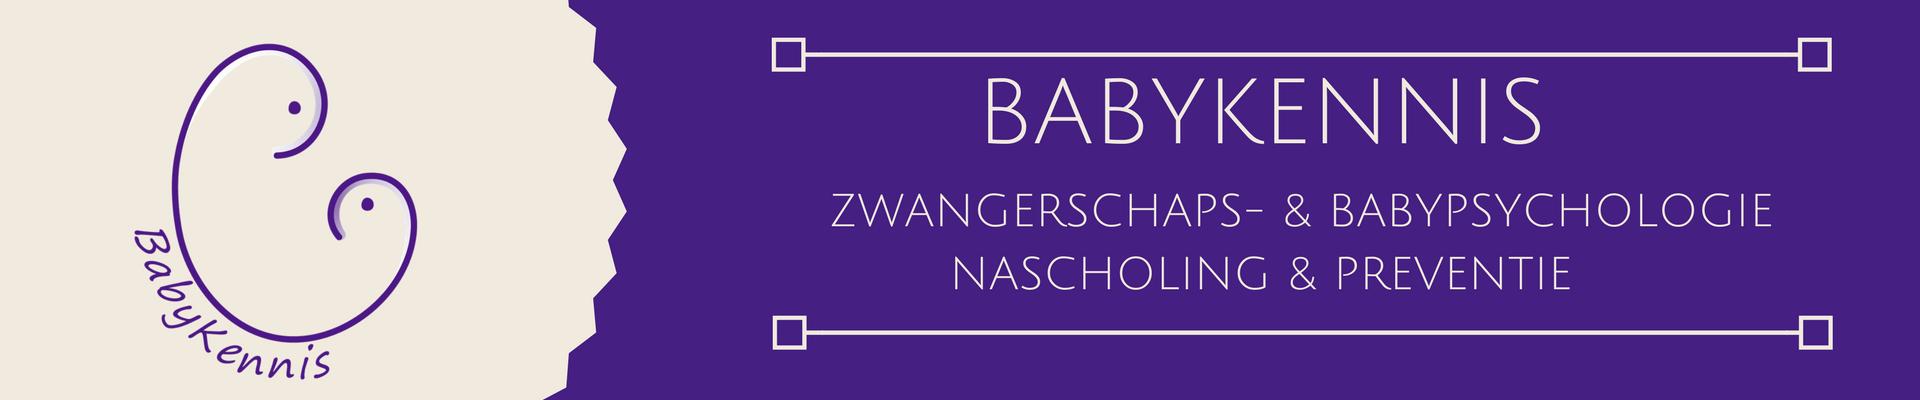 Stress in de zwangerschap- Eindhoven